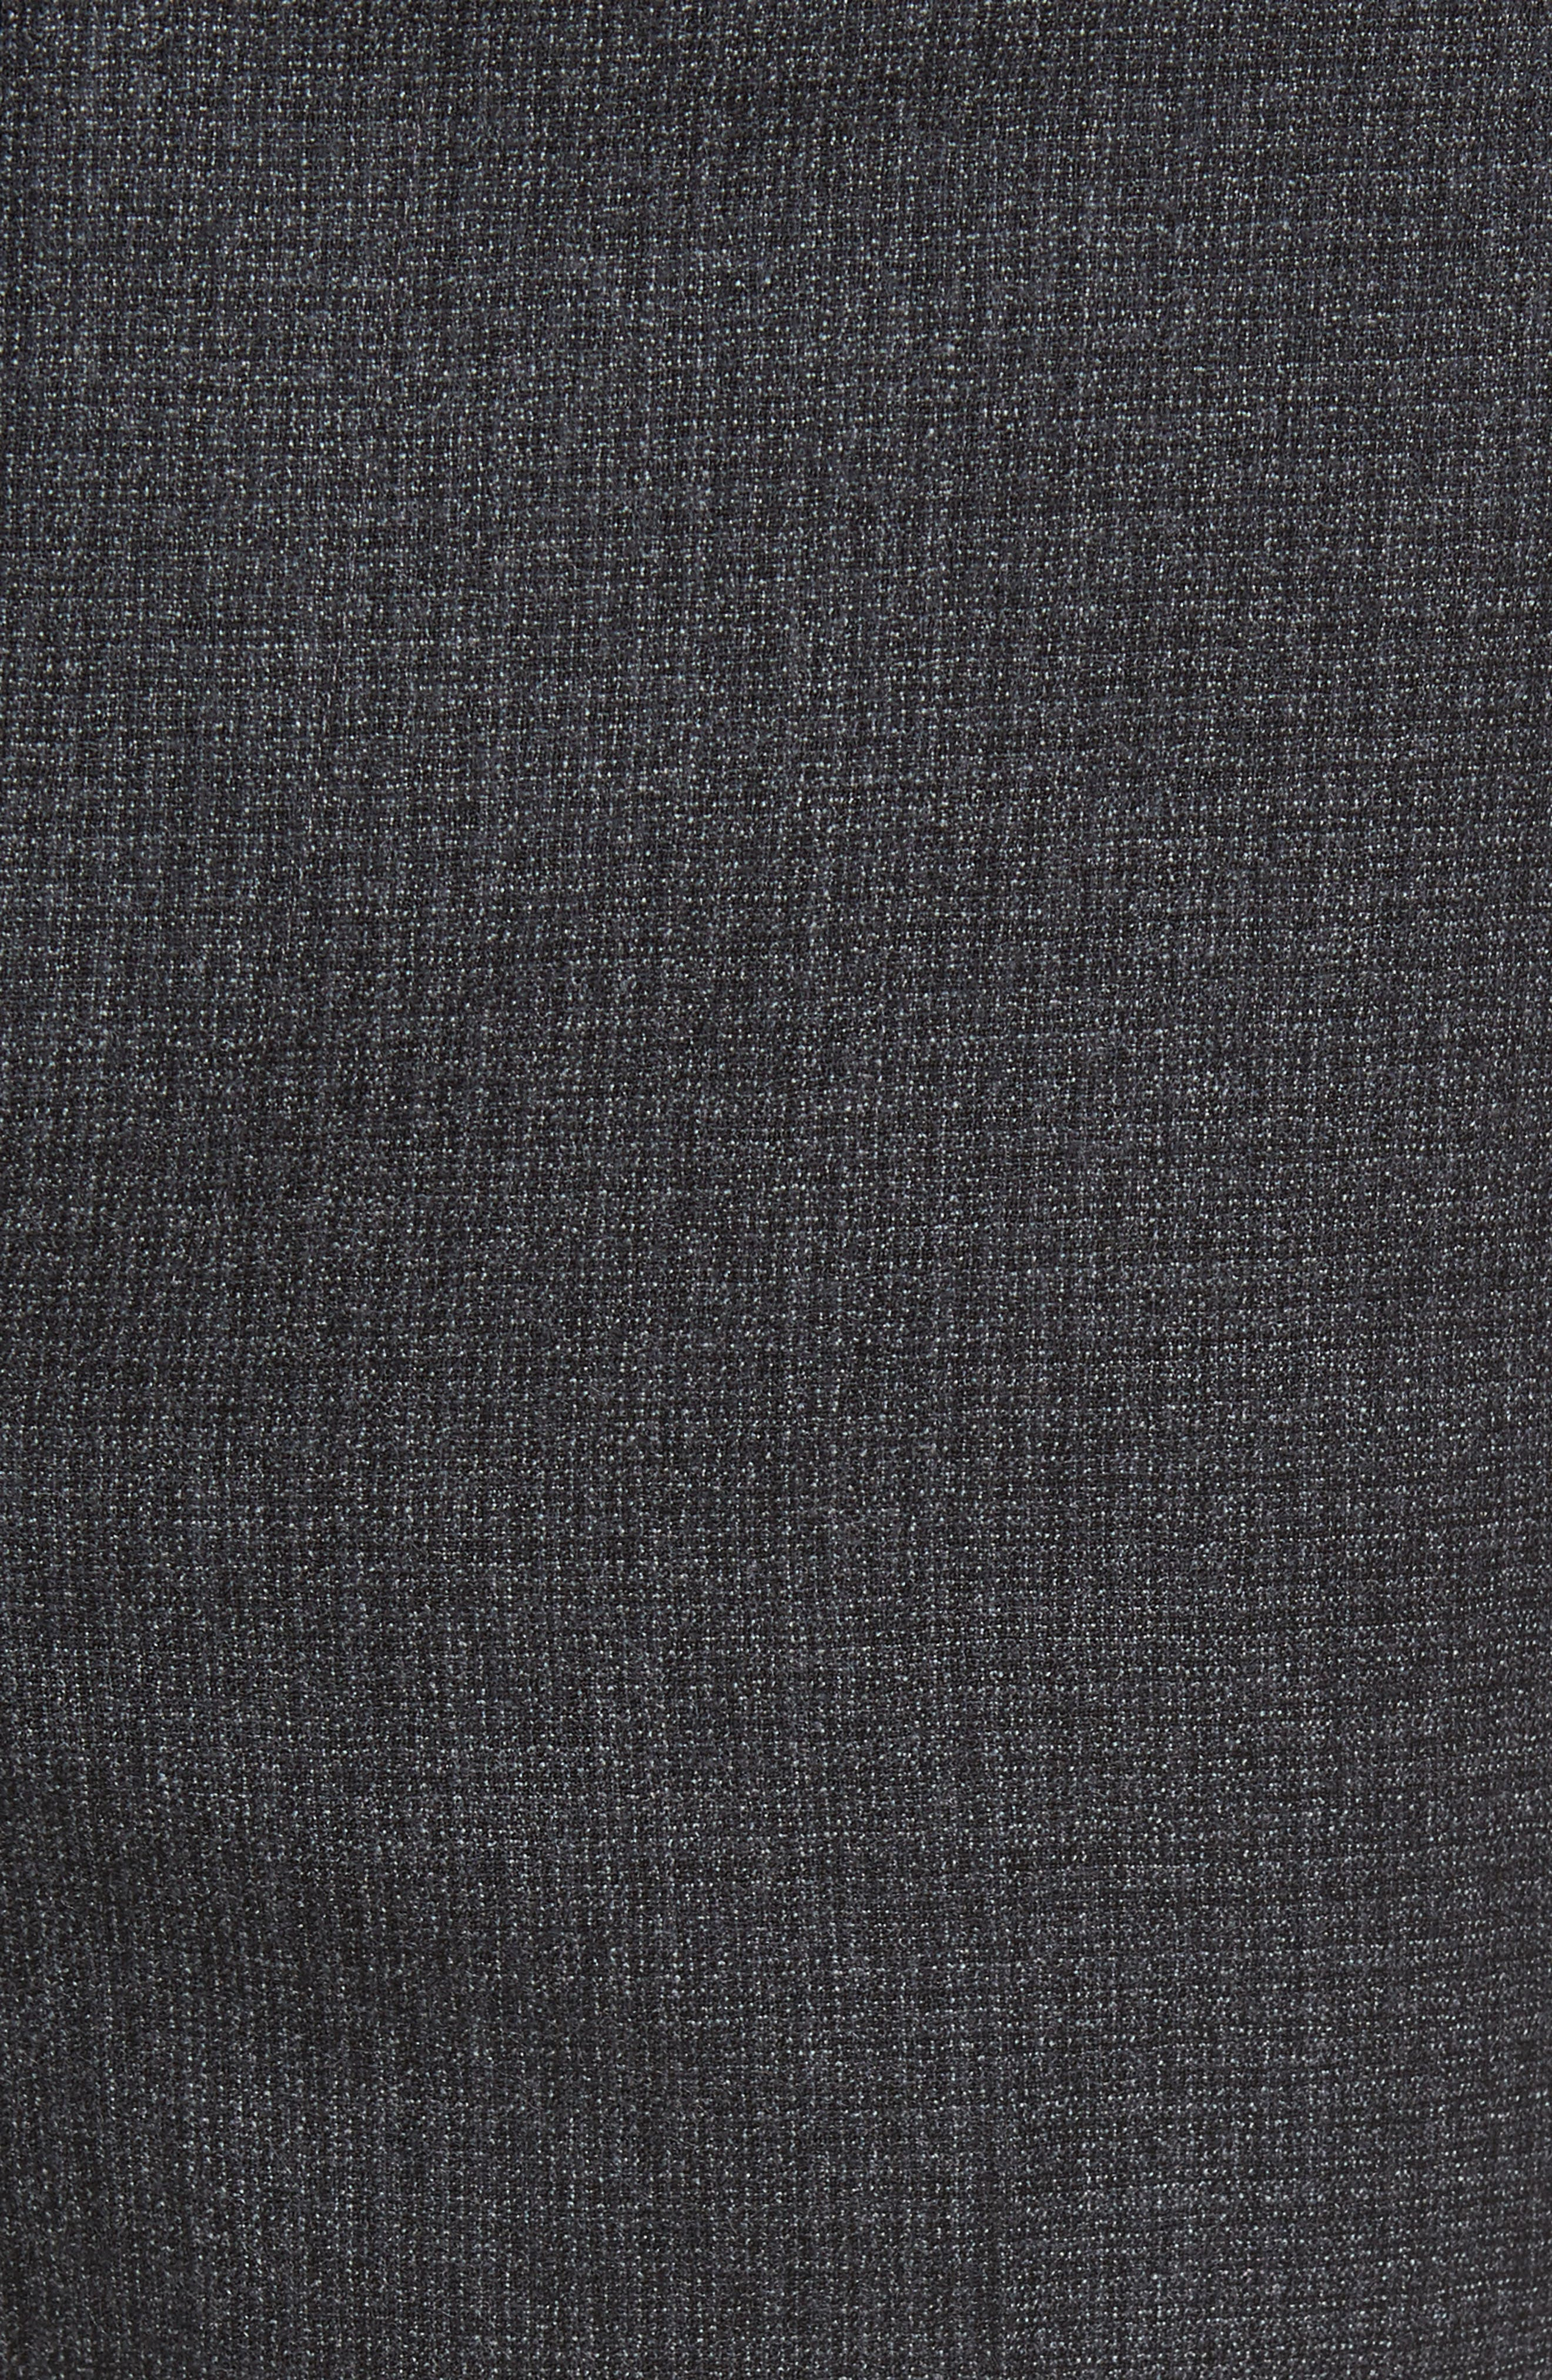 Romero Regular Fit Flat Front Trousers,                             Alternate thumbnail 2, color,                             010